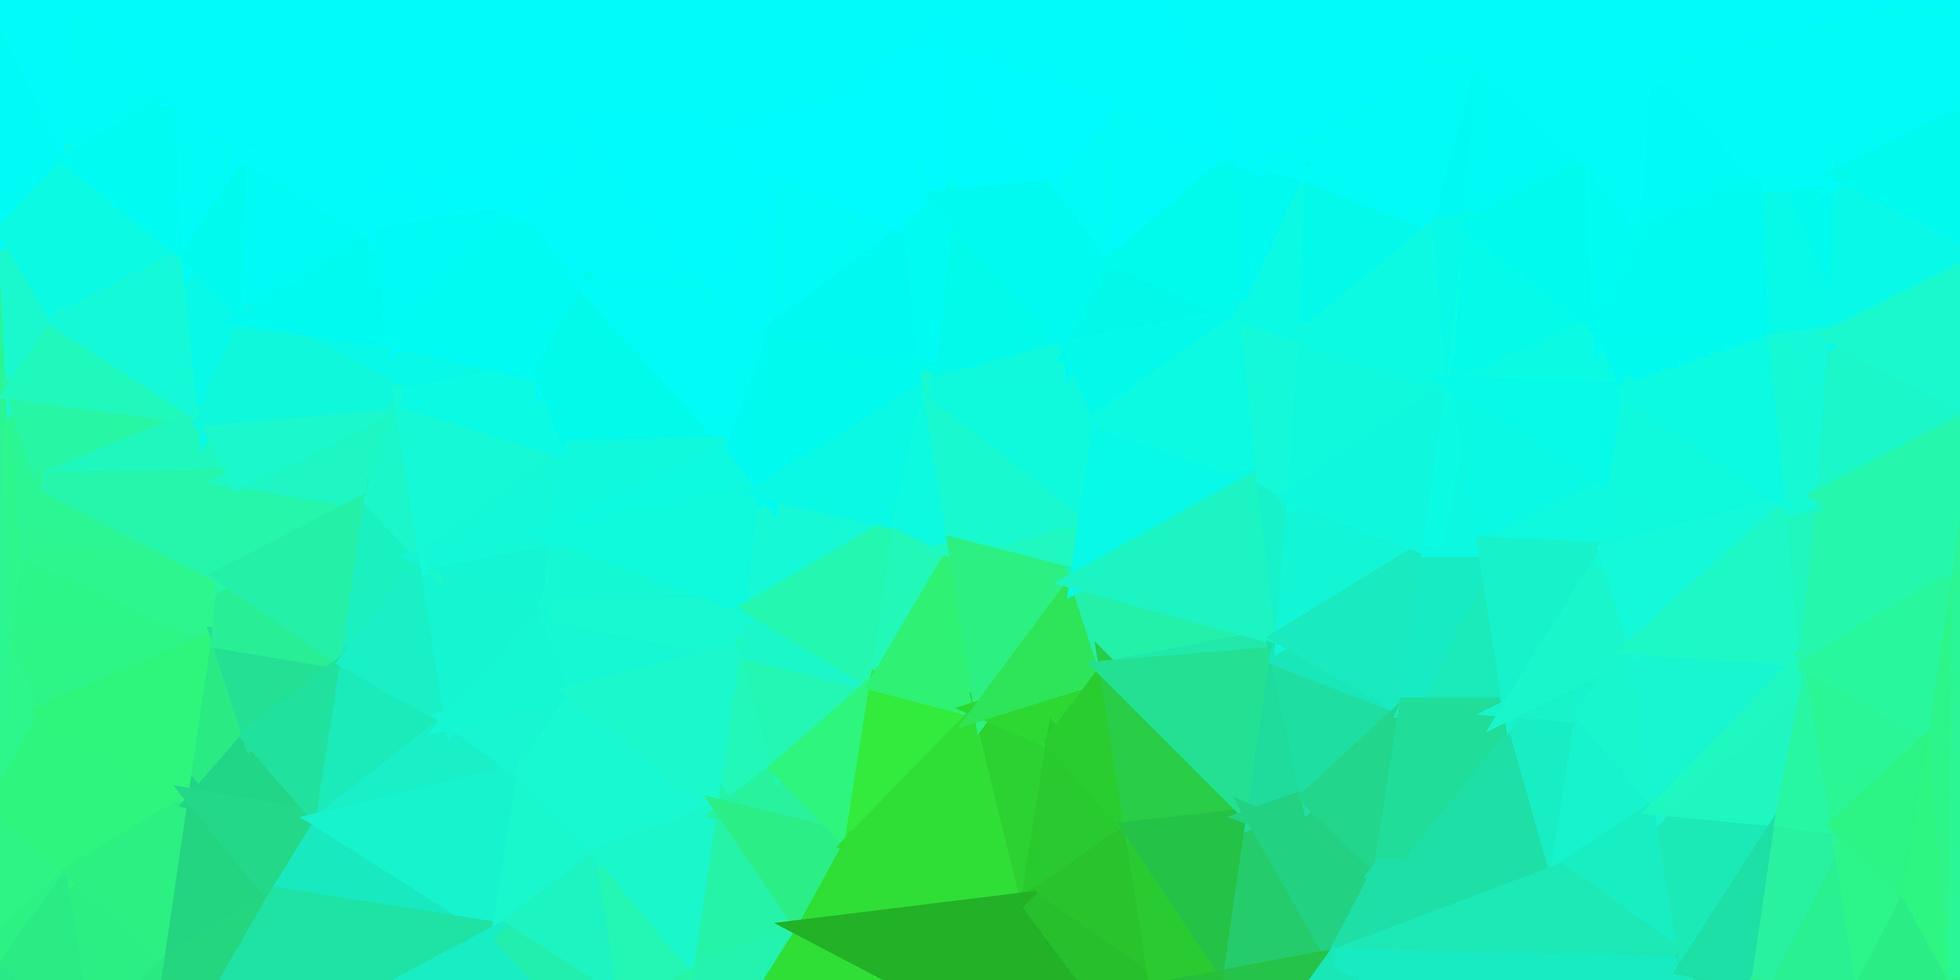 ljusgrön vektor geometrisk polygonal design.